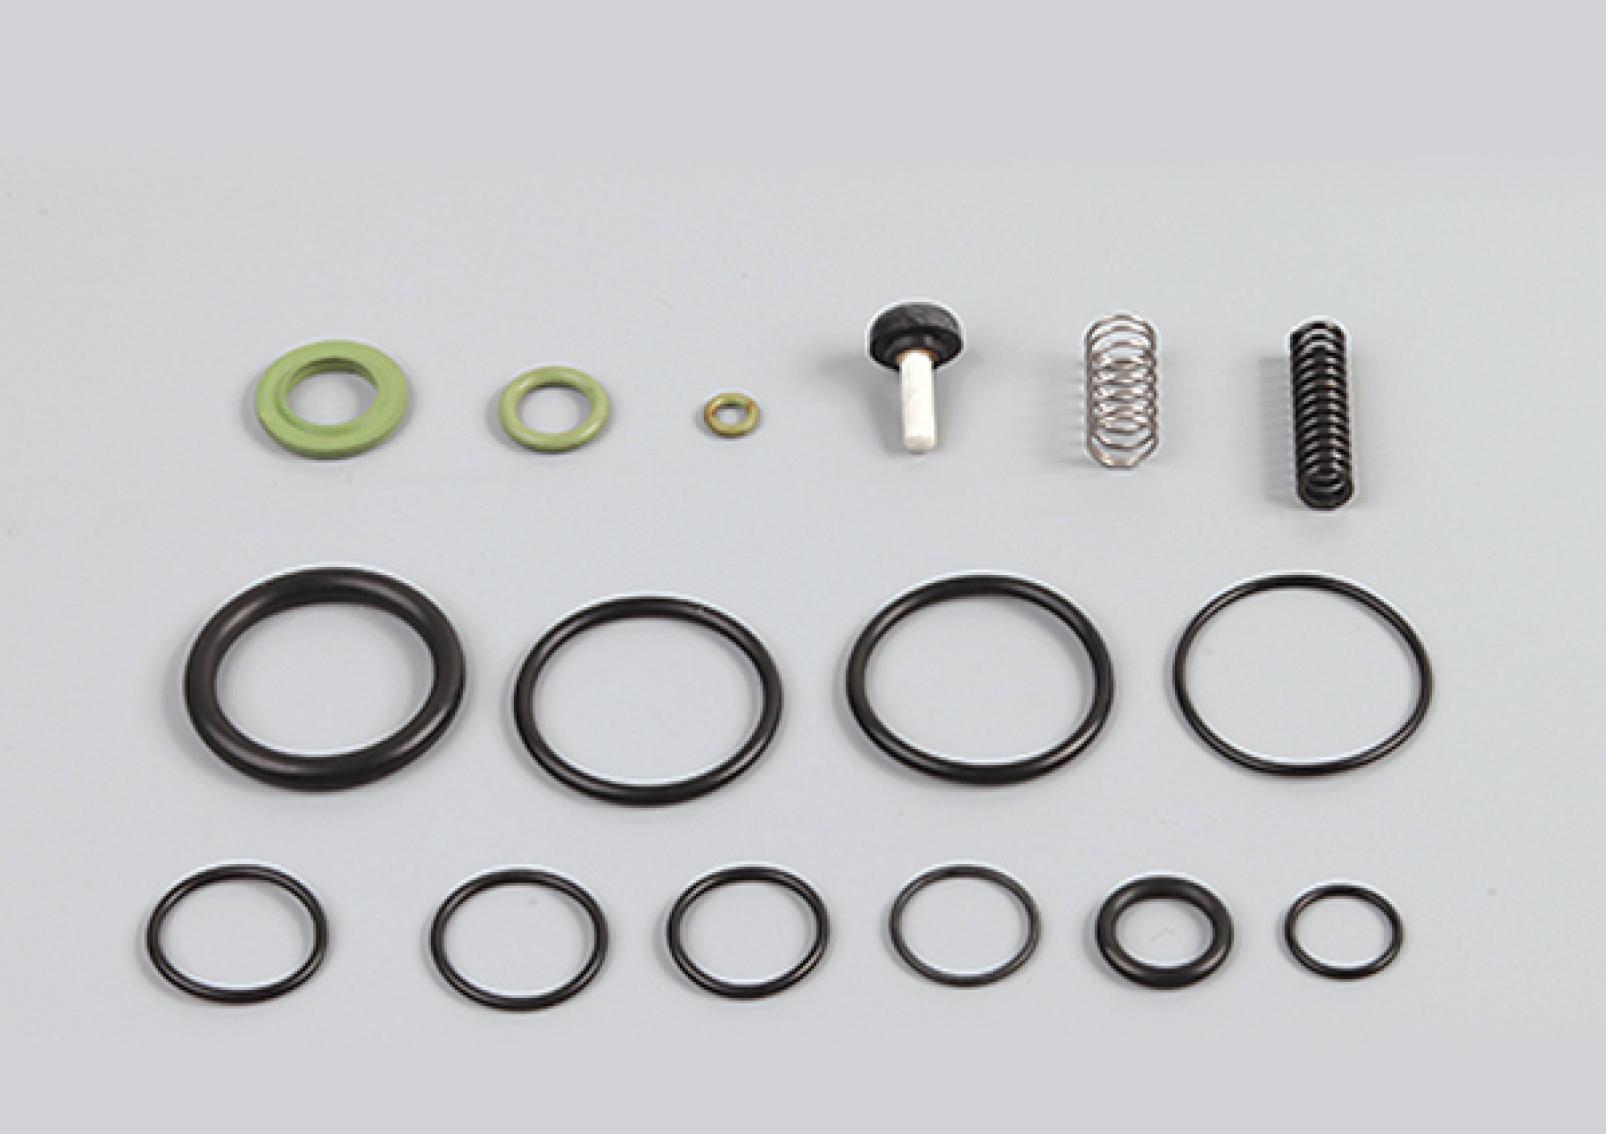 Air Dryer Valve Repair Kit, I90121